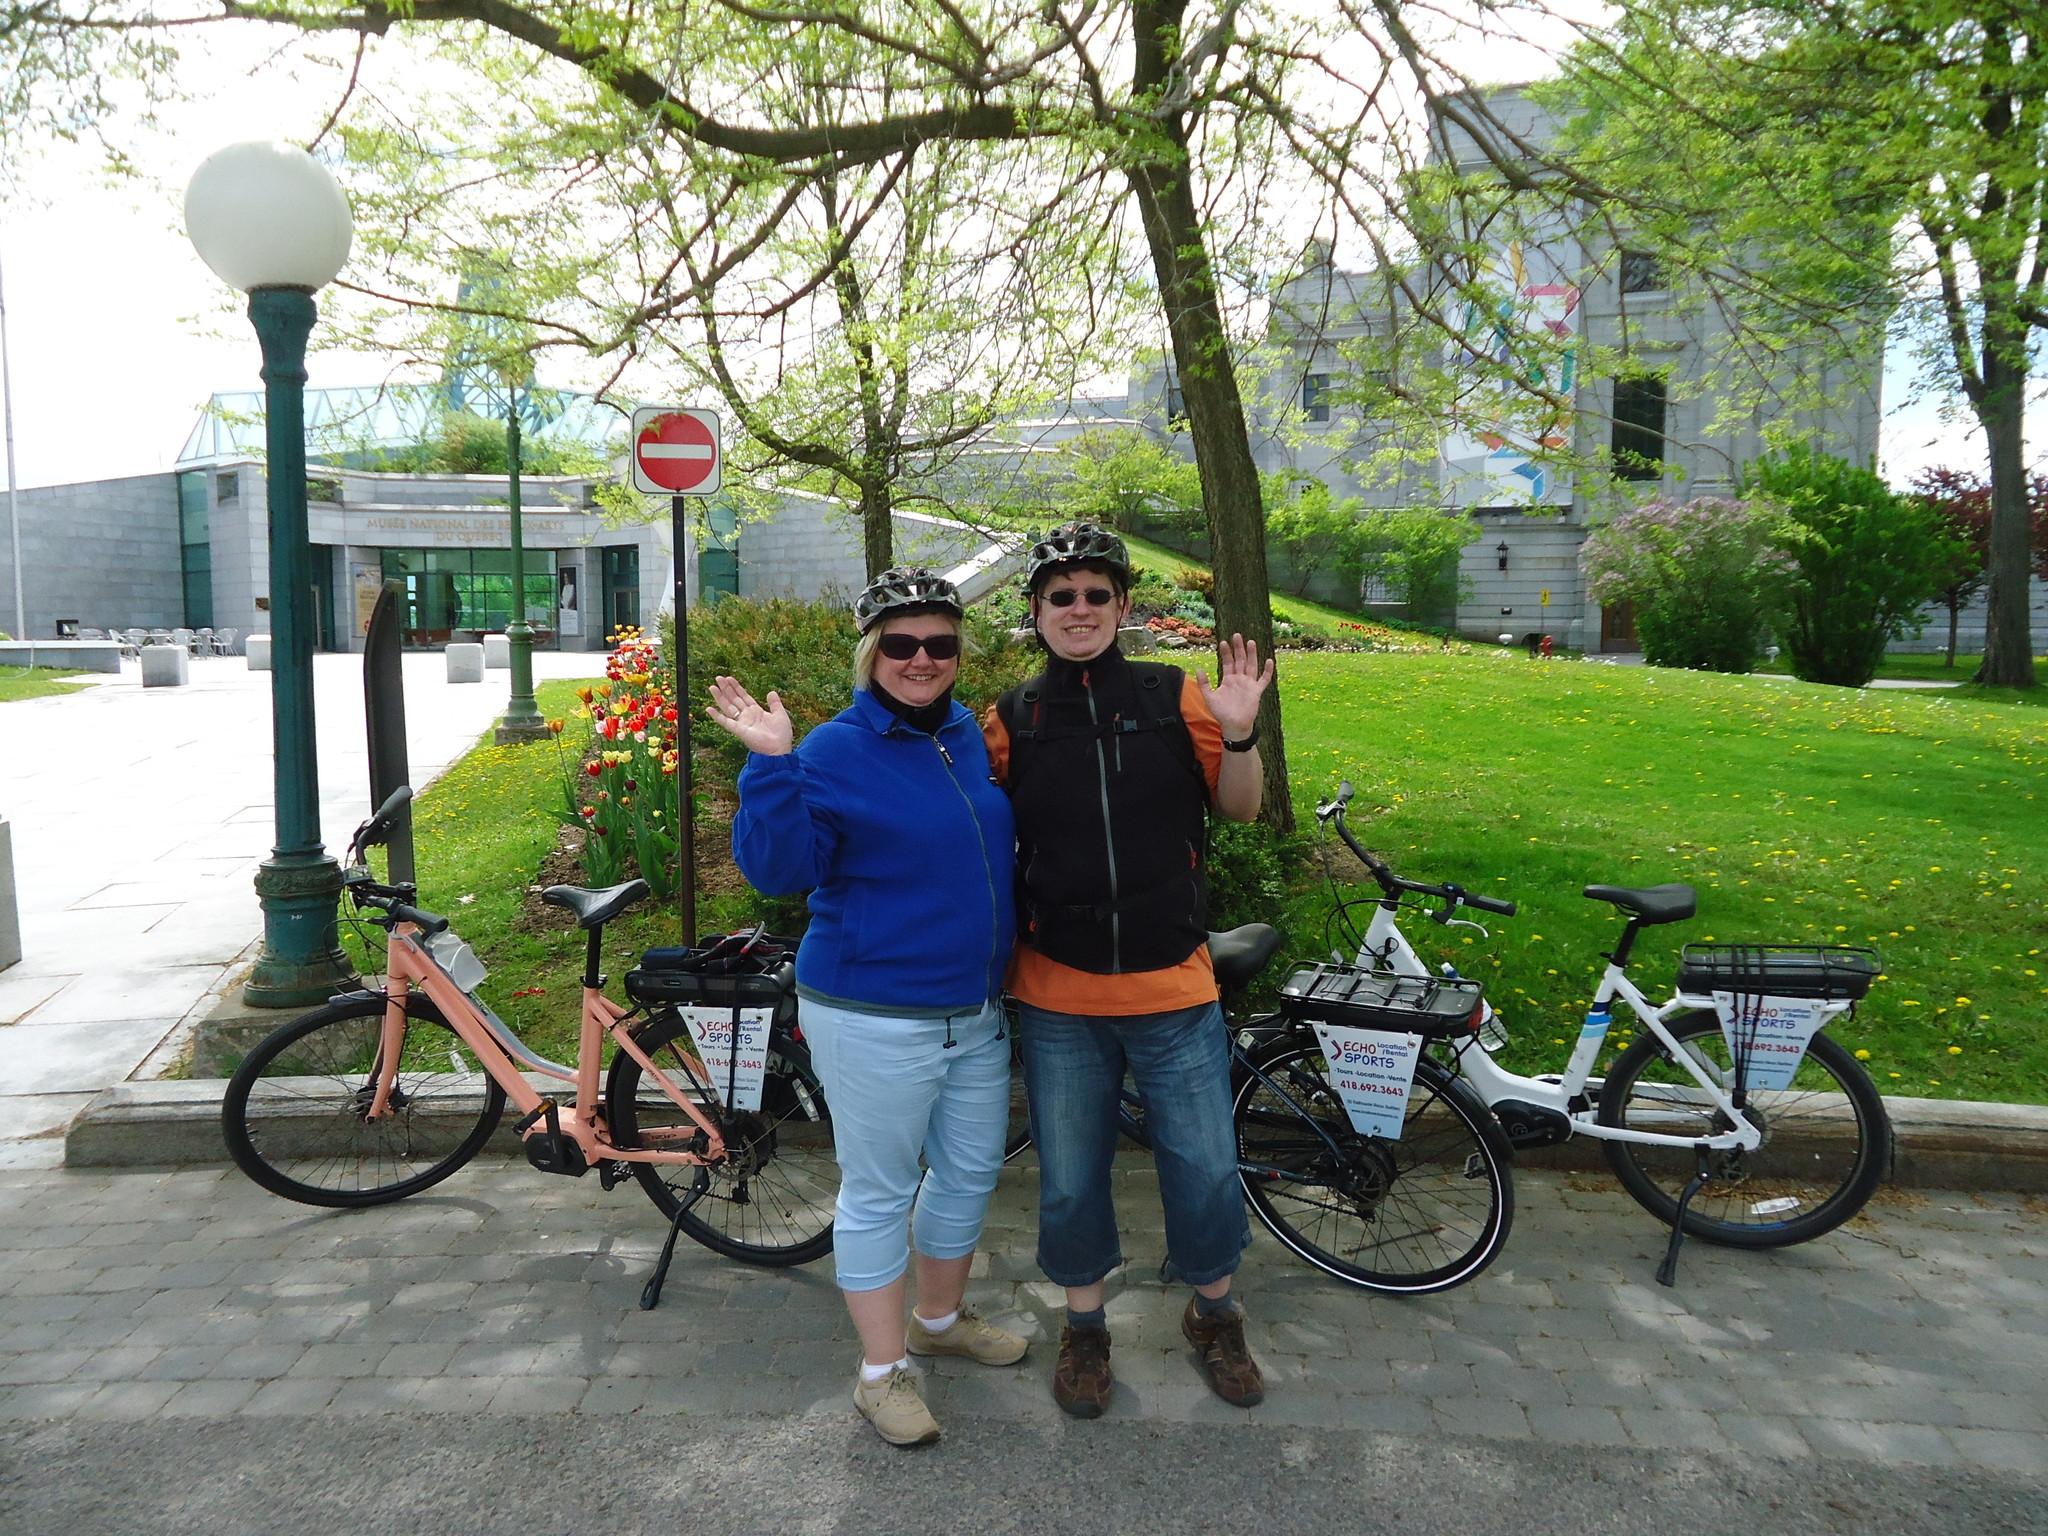 Québec electric bike tour, 95$